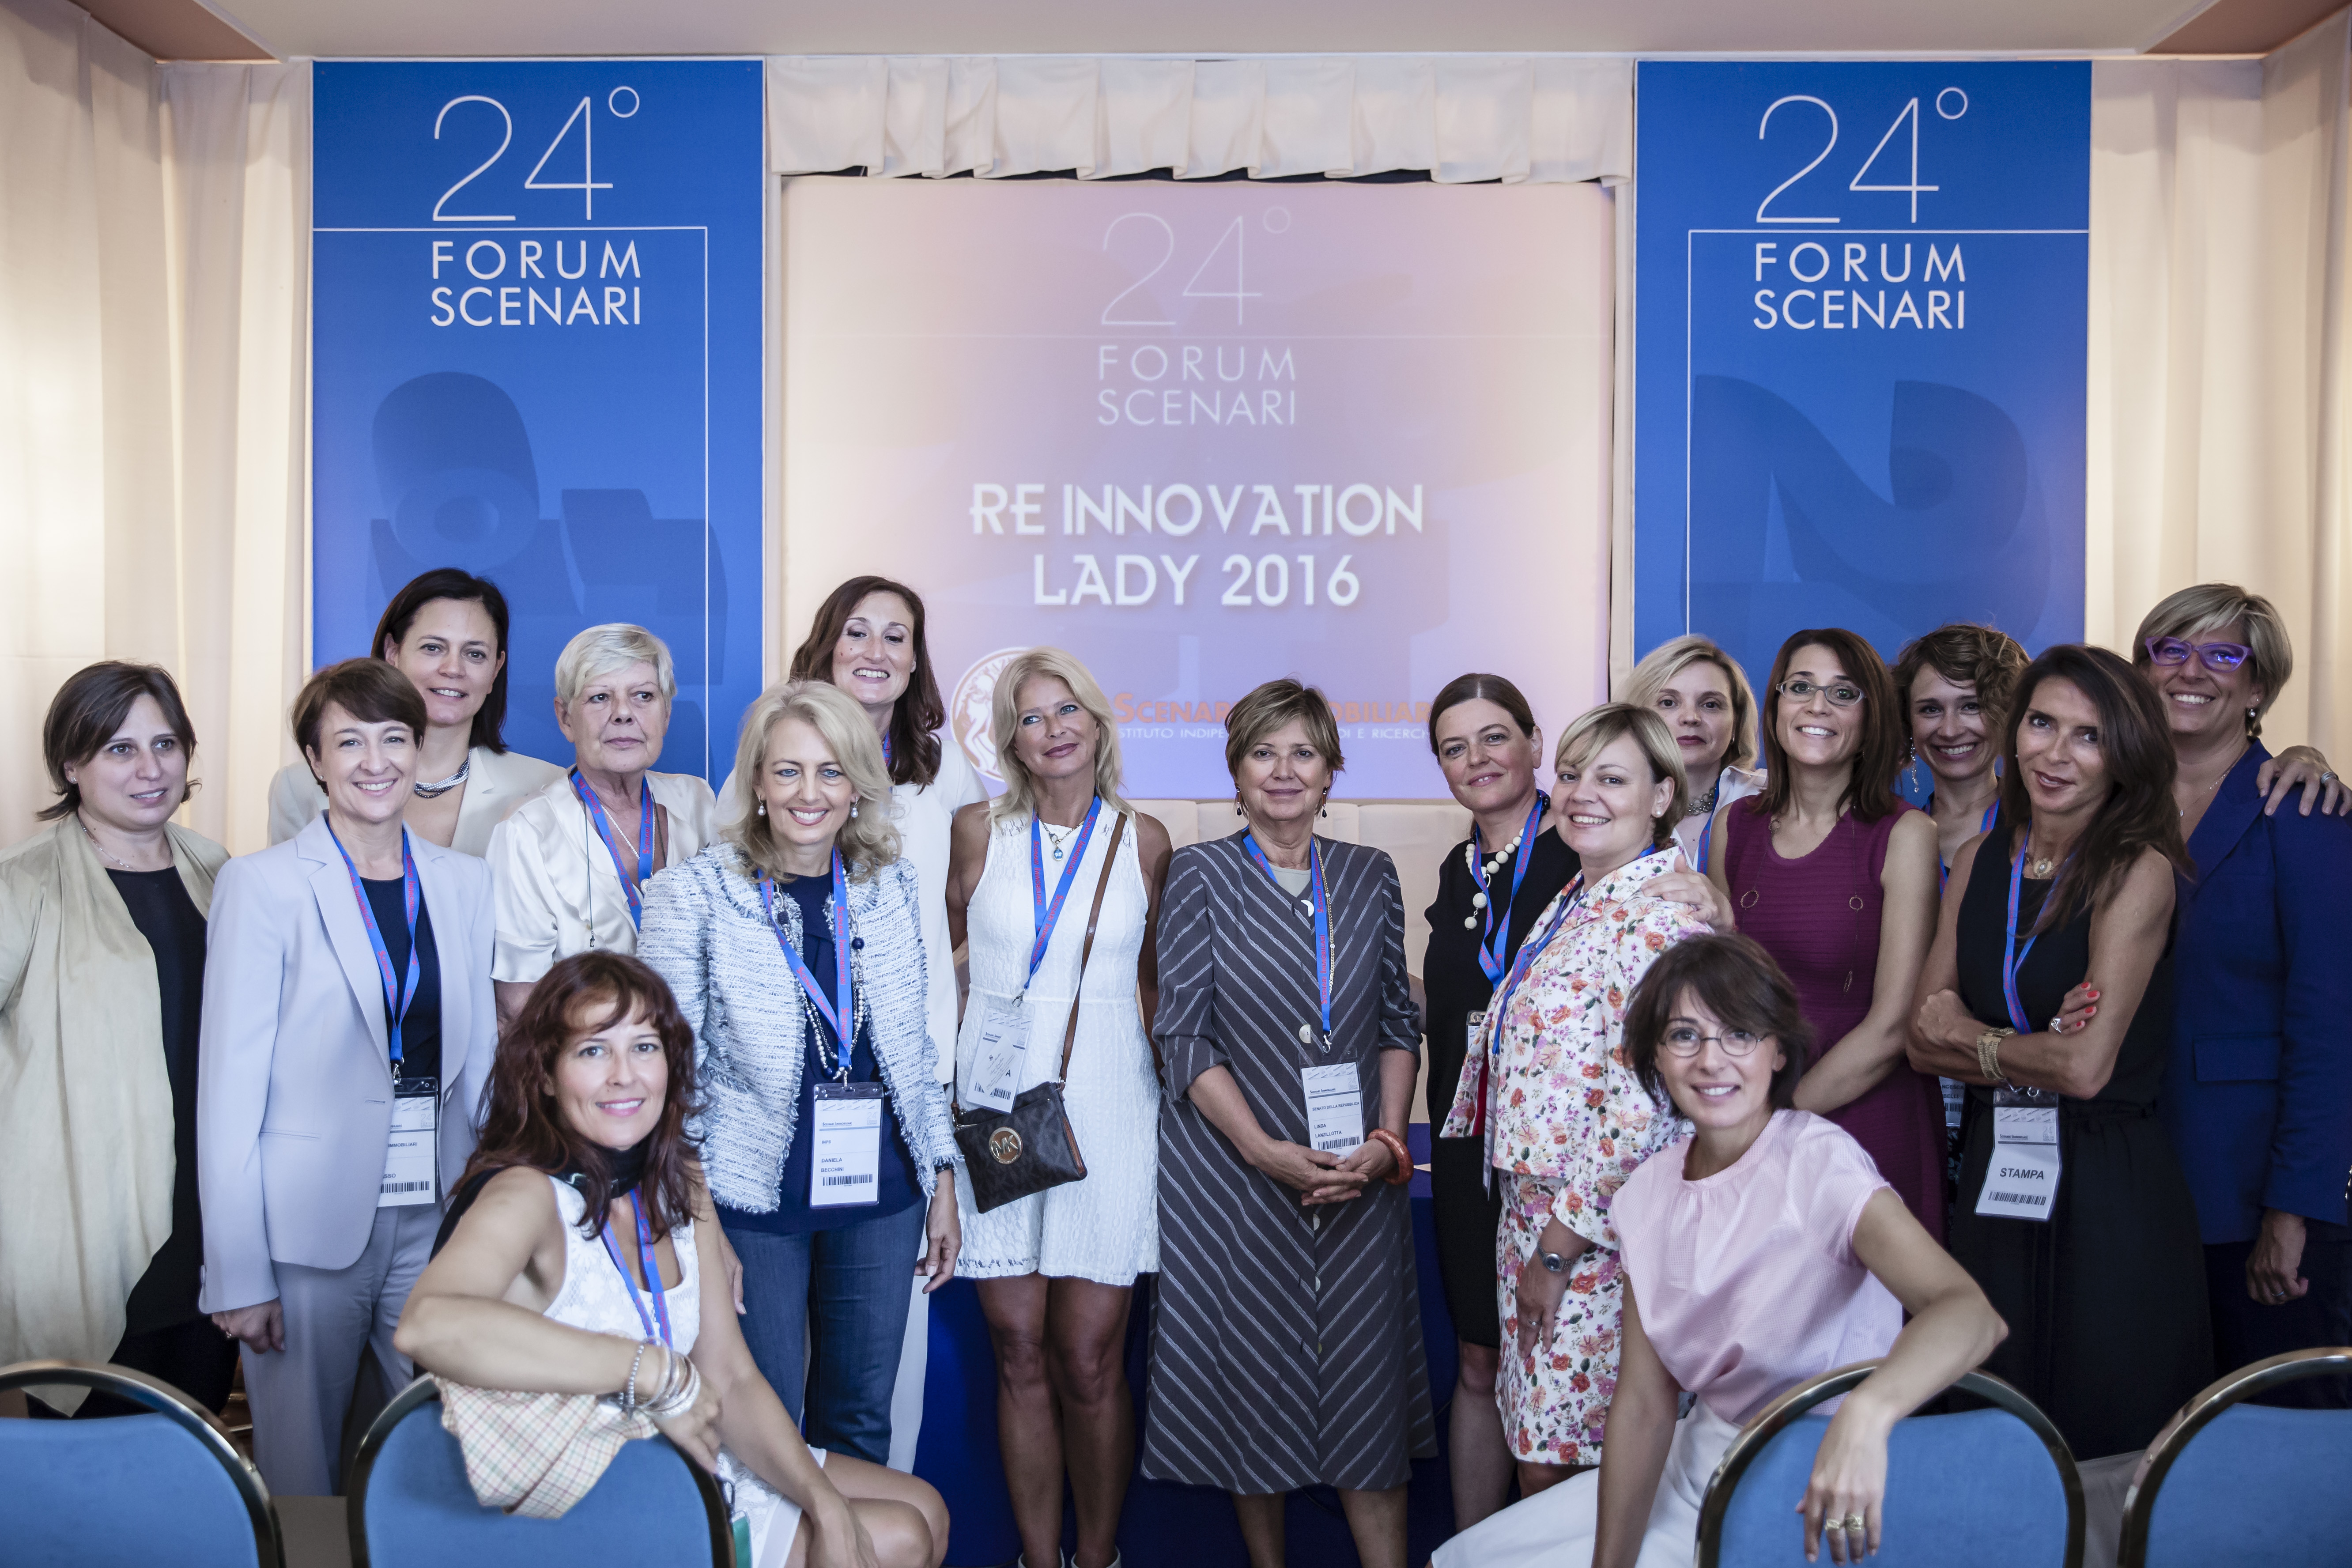 Premio RE Innovation Lady 2016